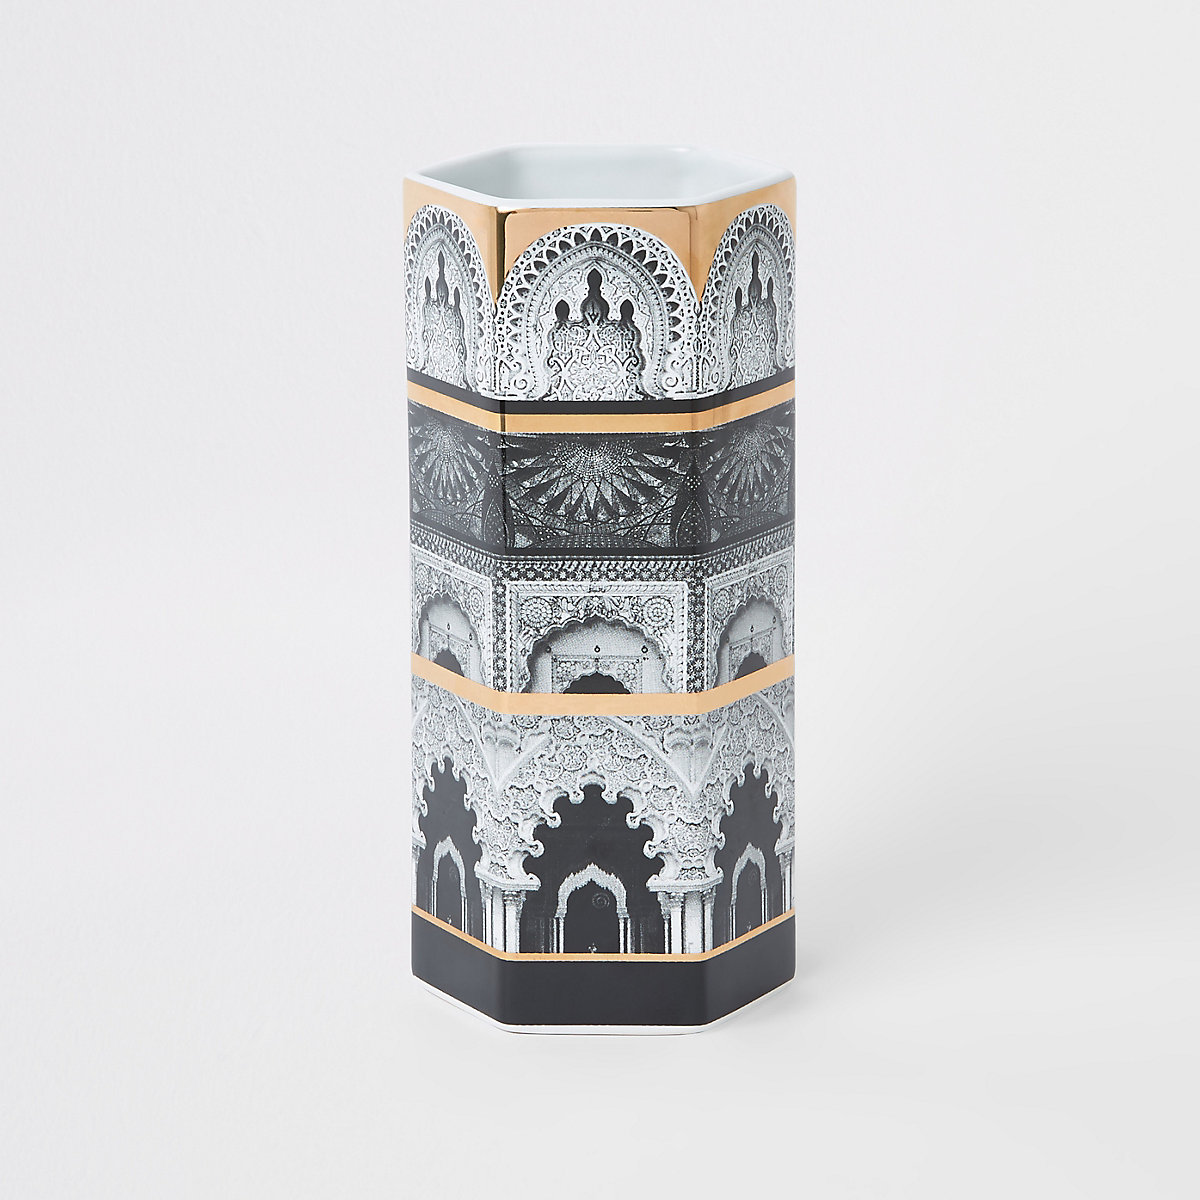 Hexagonal printed white ceramic vase